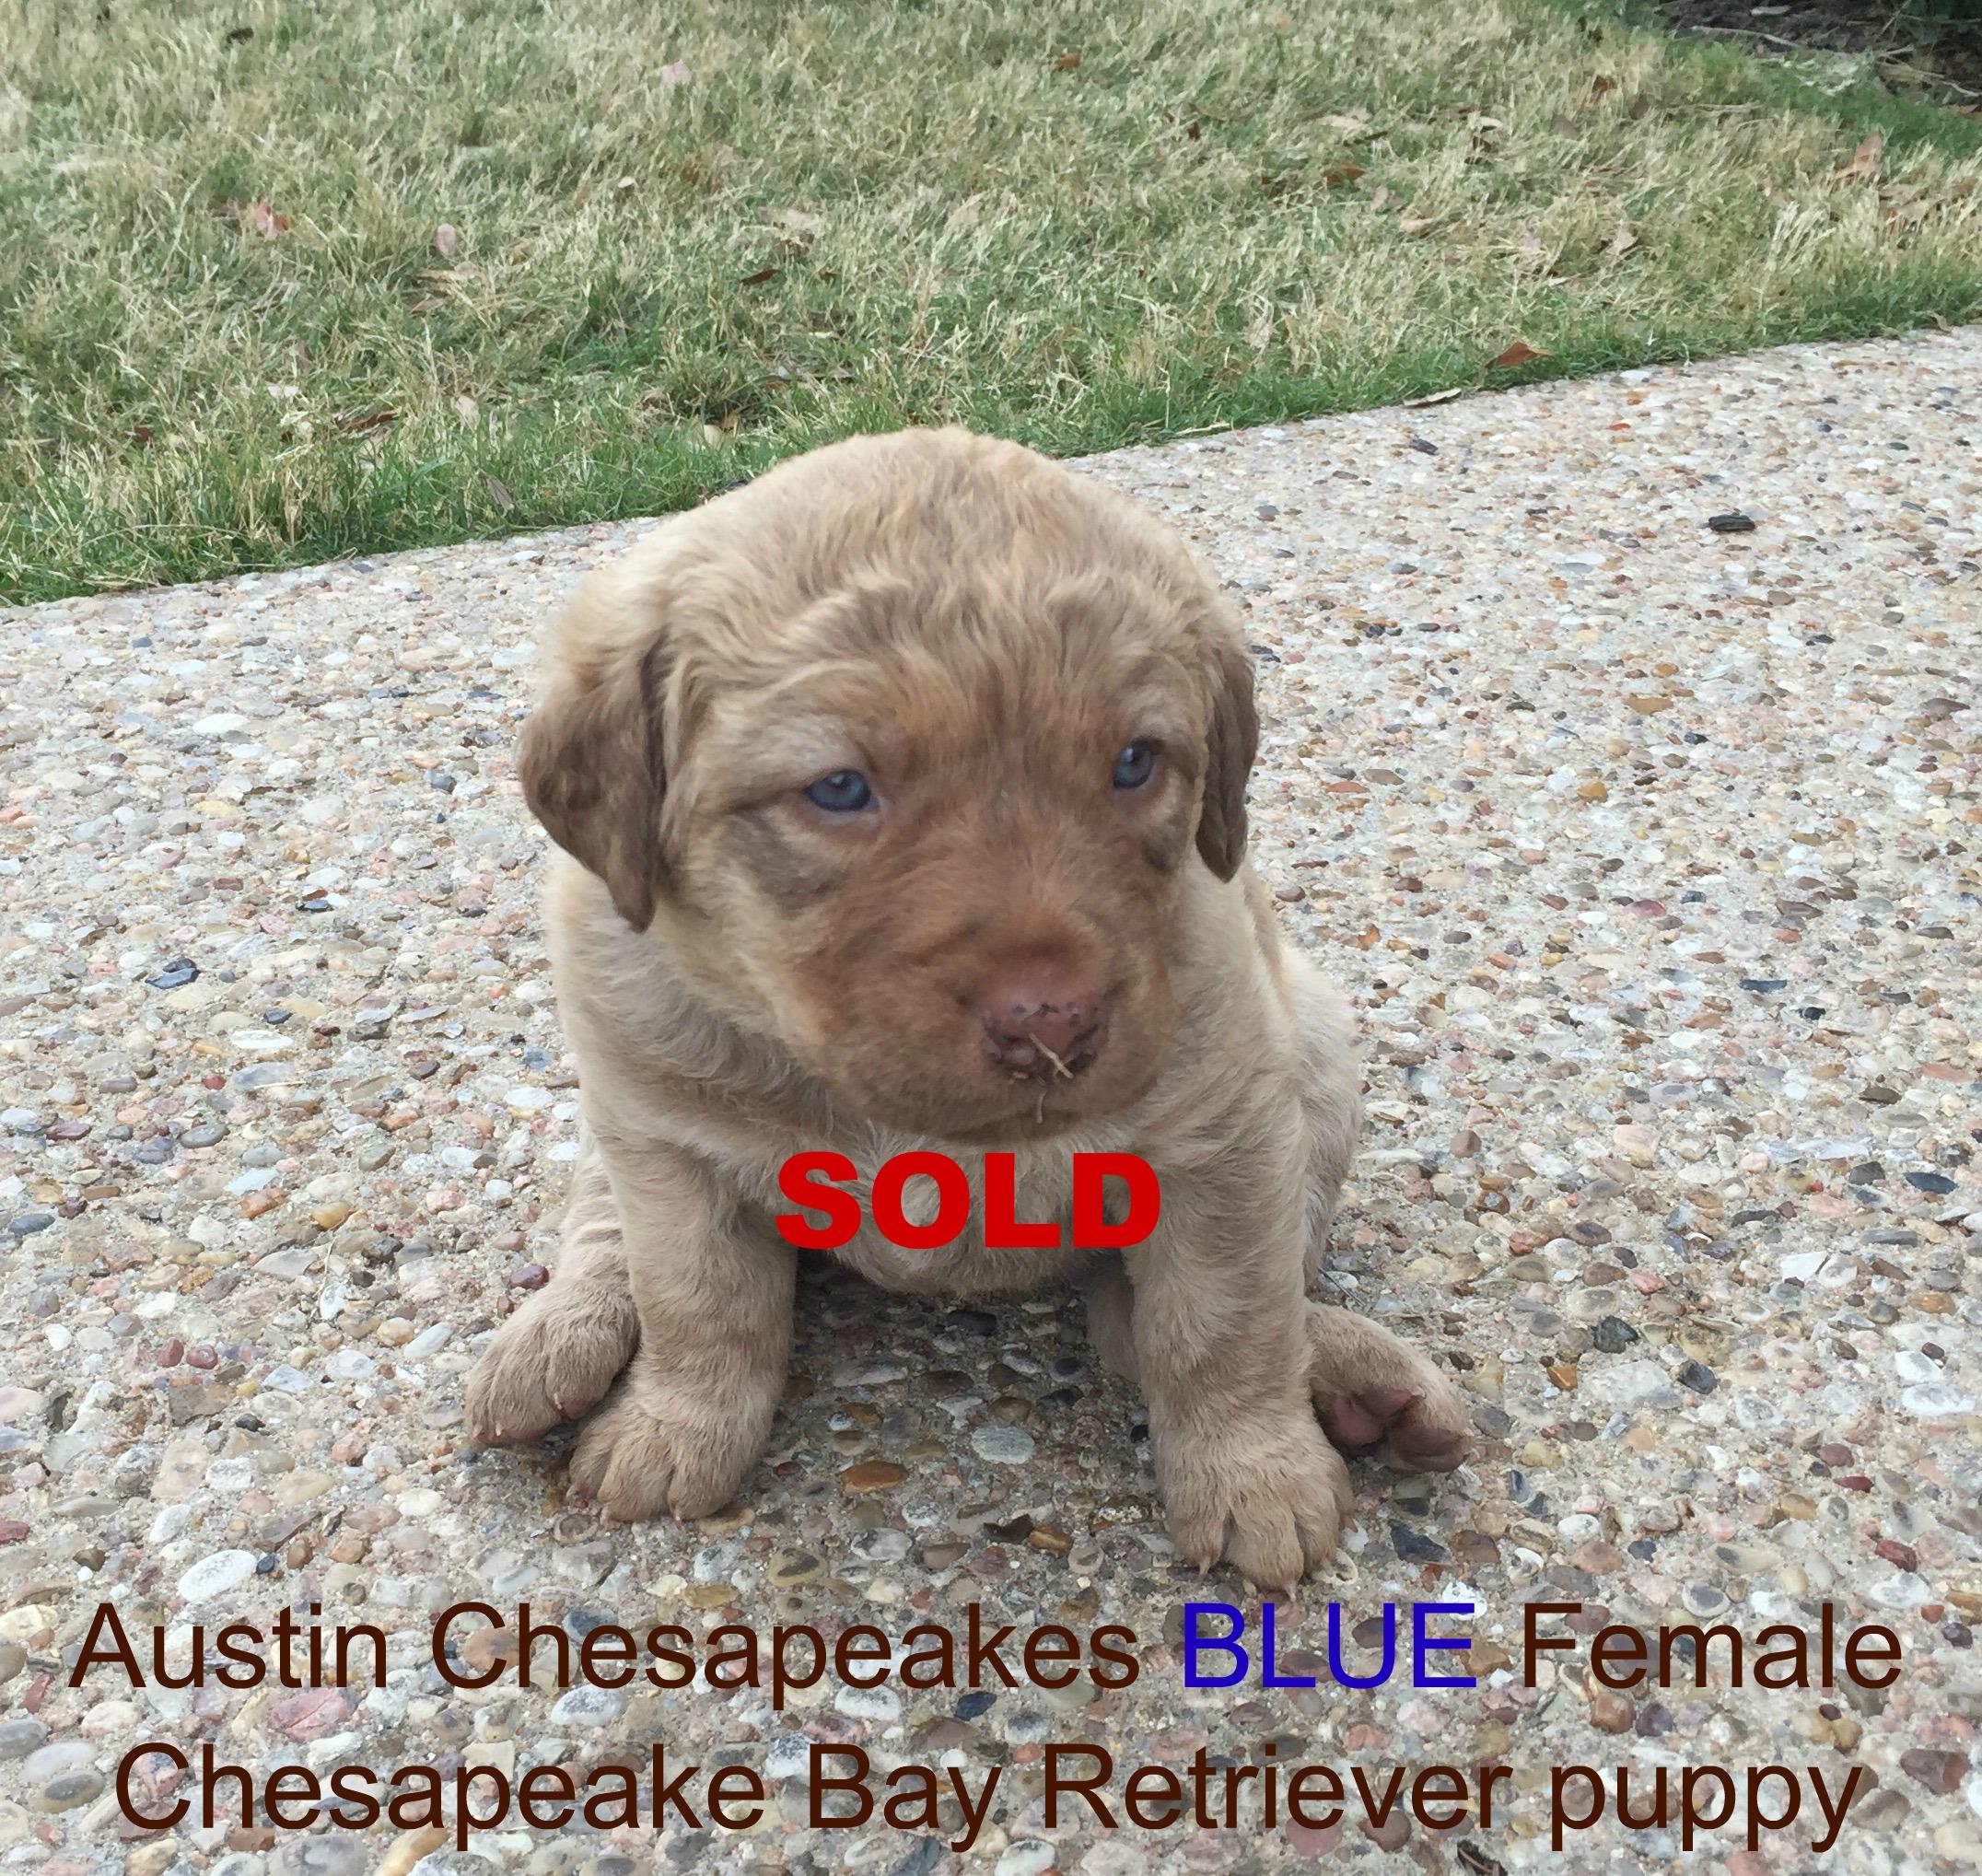 Blue sold